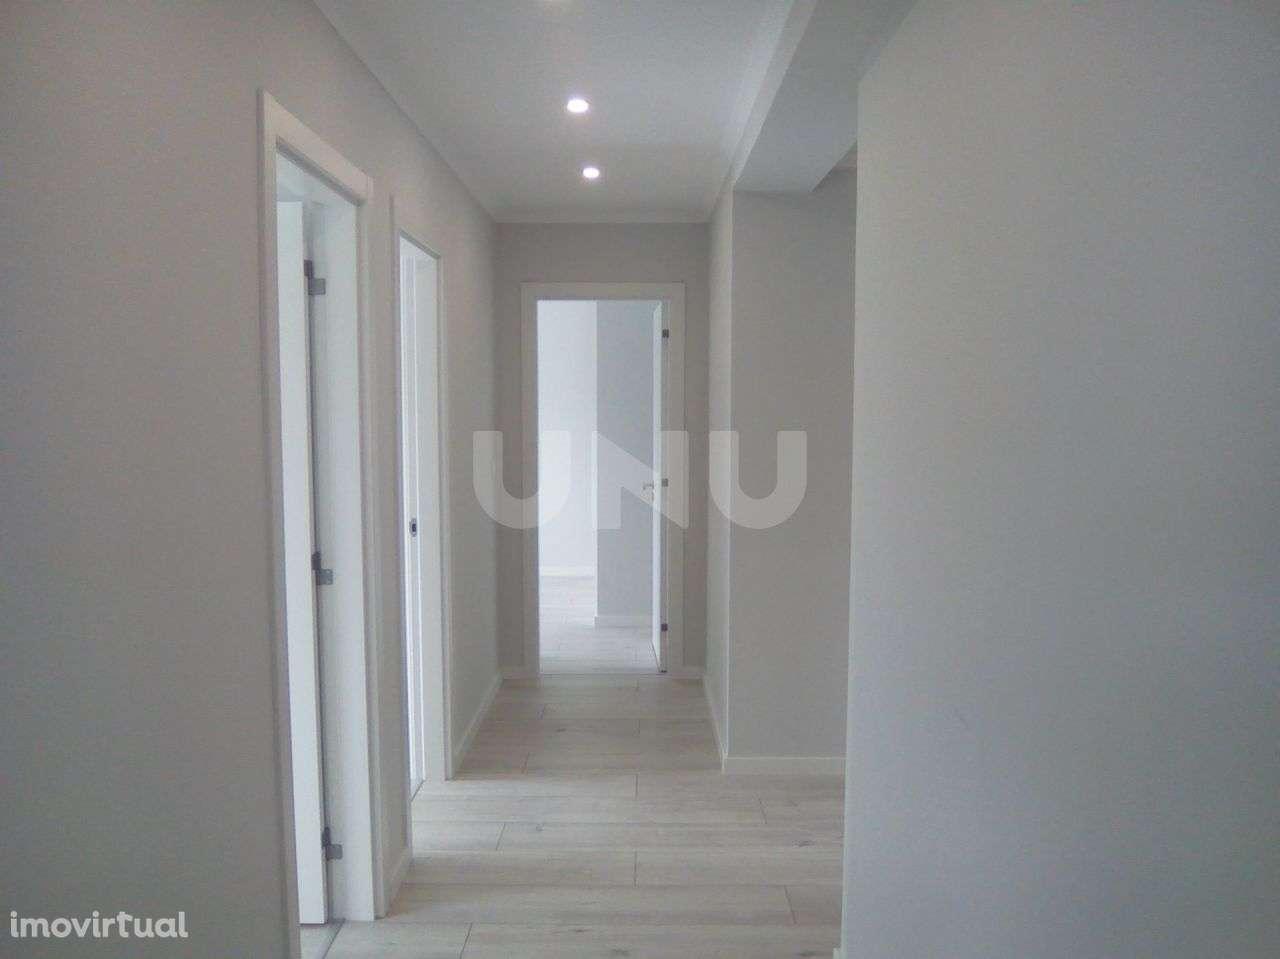 Apartamento para comprar, Barcarena, Lisboa - Foto 1